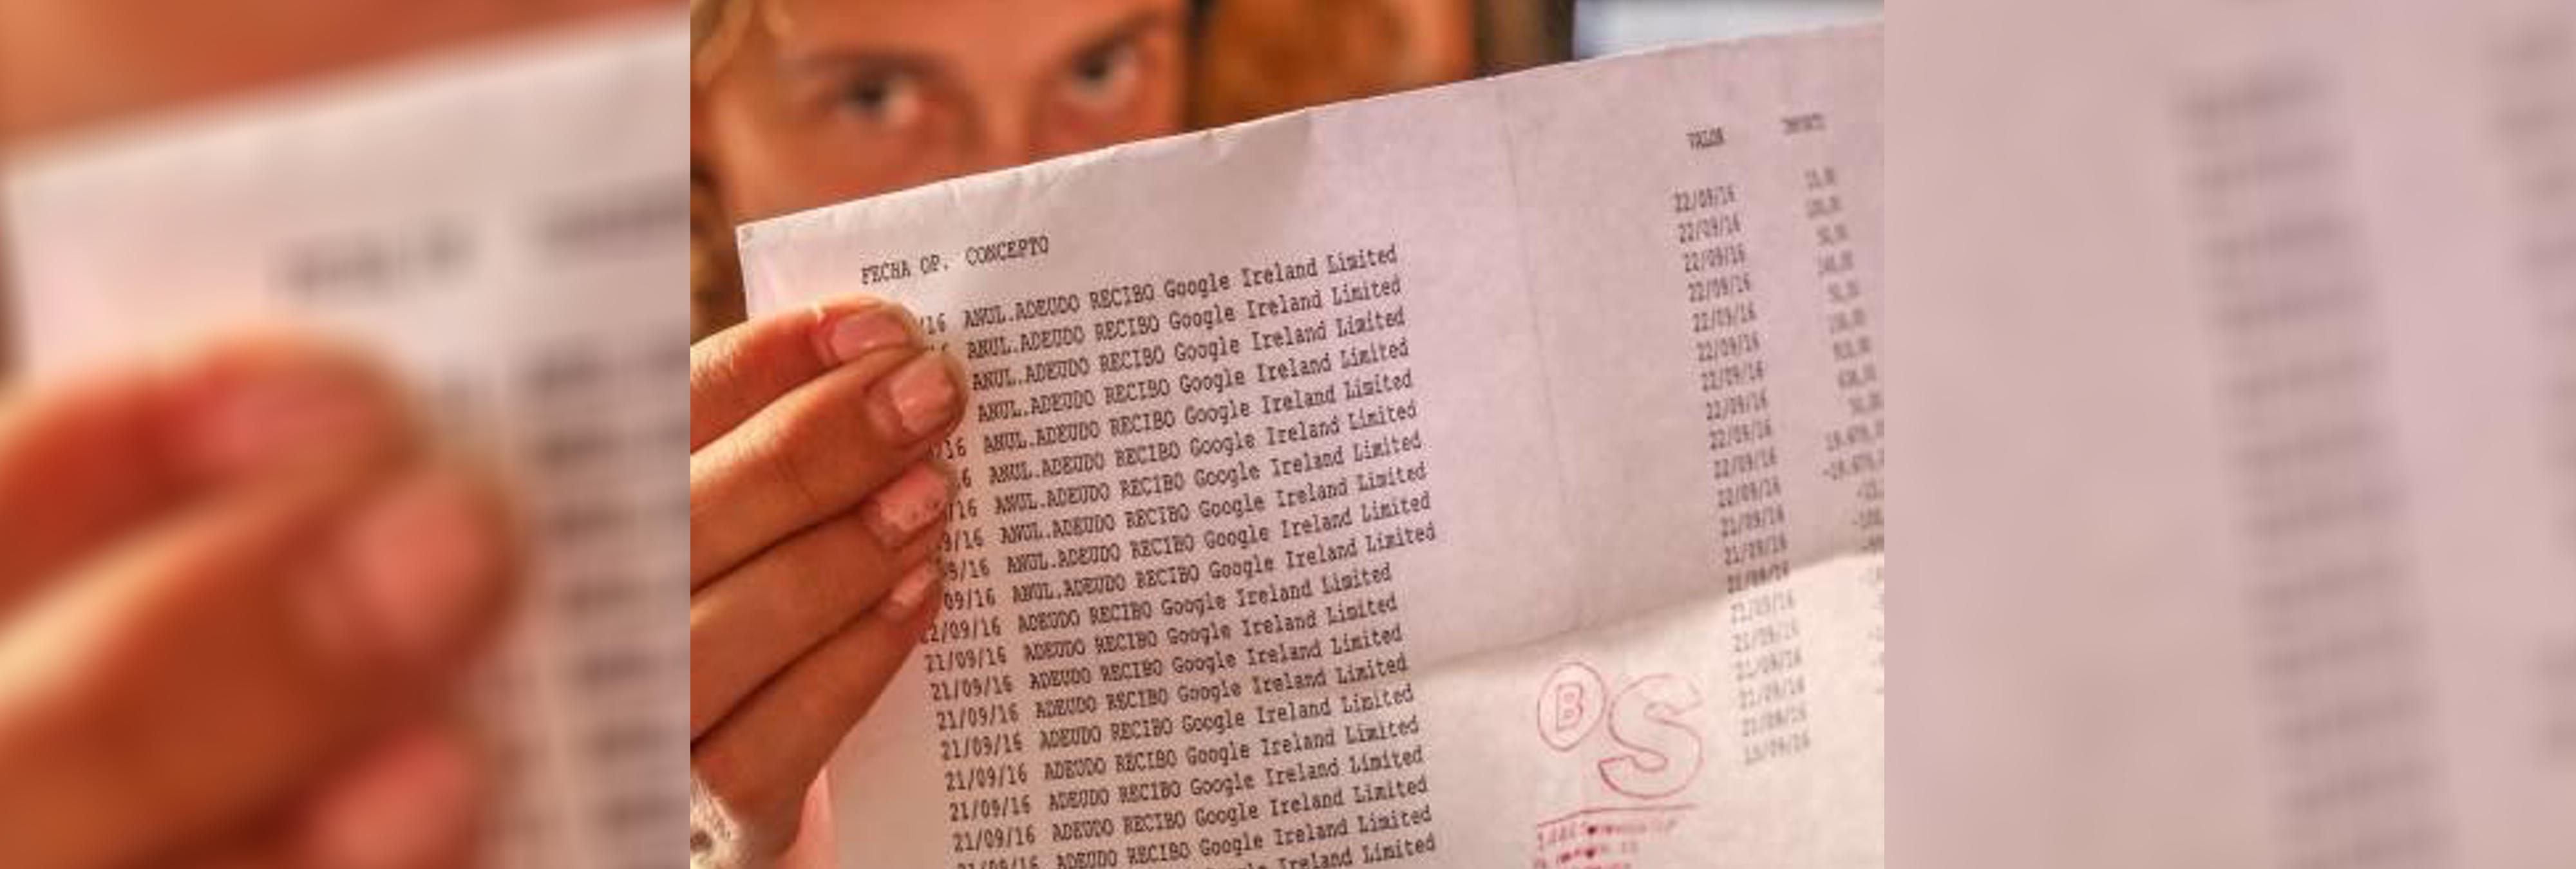 Niño de 12 años debe 100.000 euros a Google